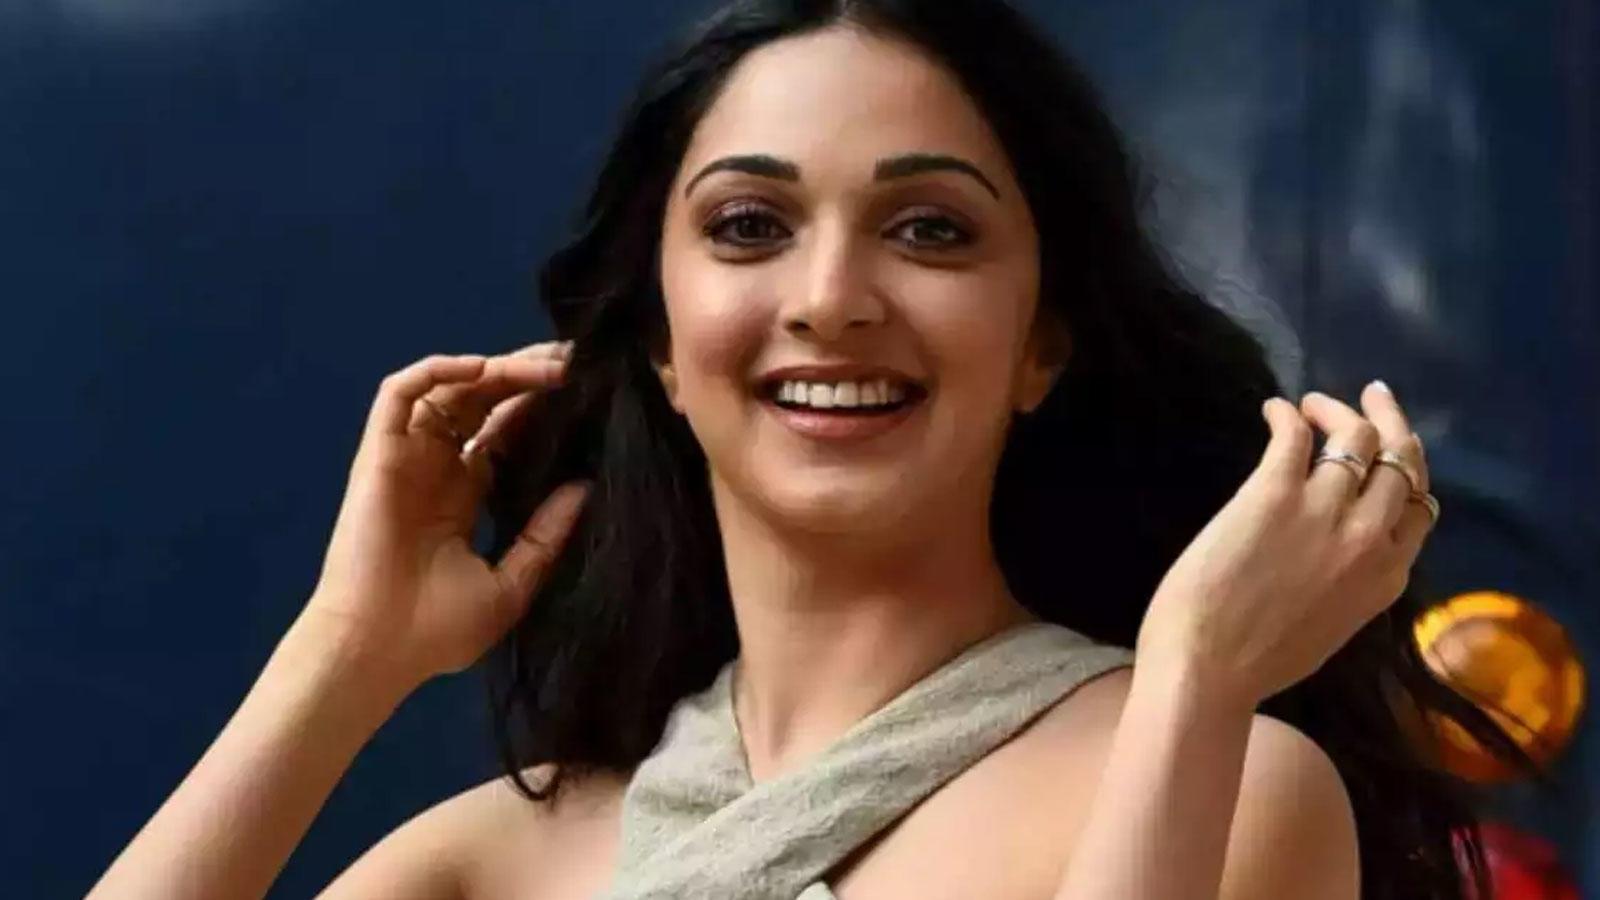 kiara-advani-to-join-ranveer-singh-for-hindi-remake-of-tamil-hit-anniyan